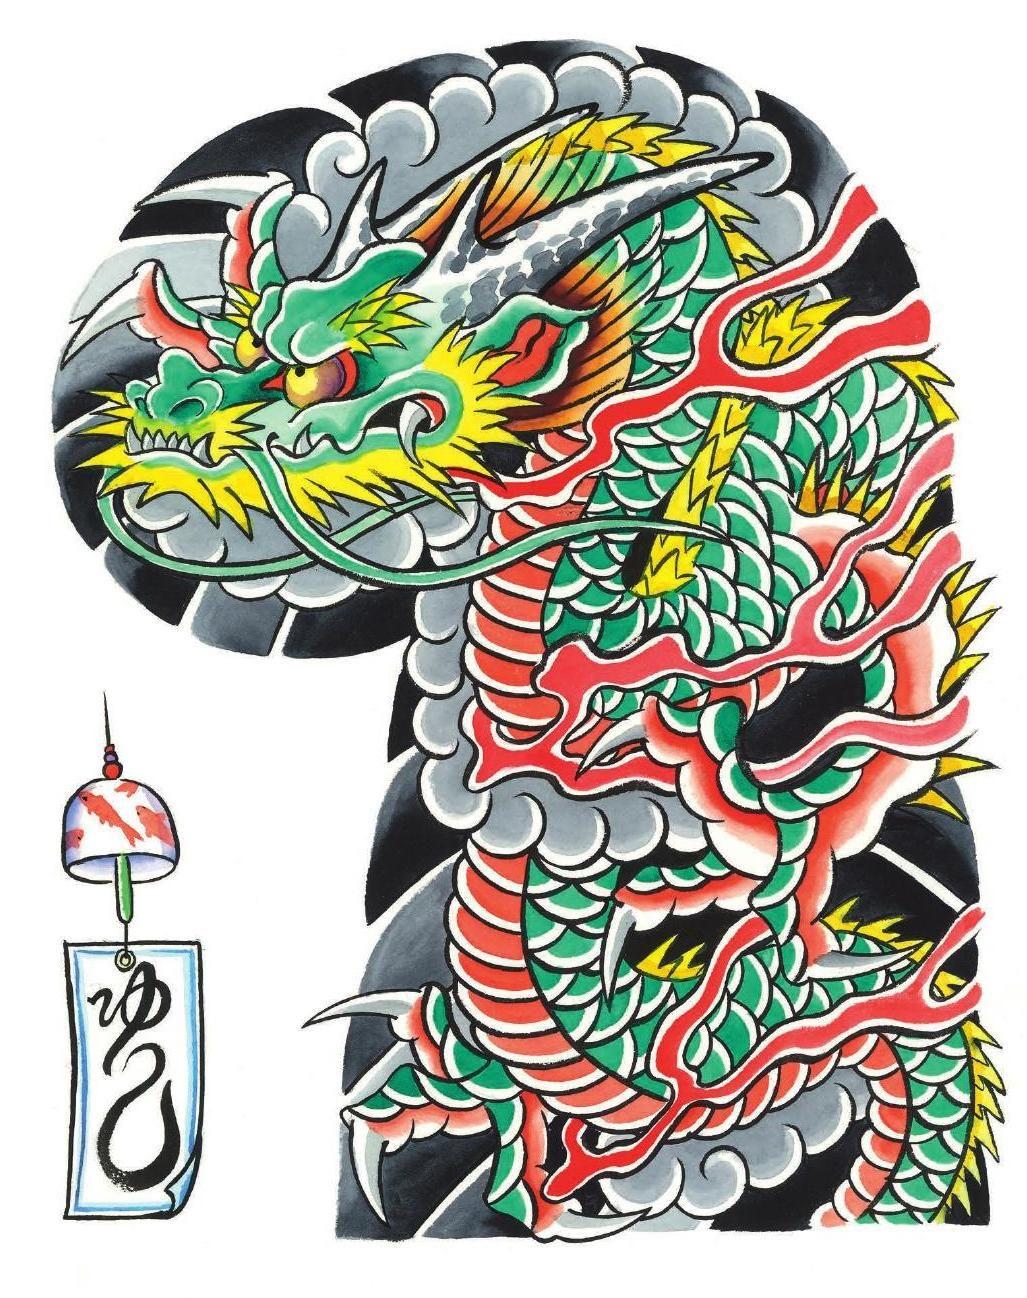 Garyou Tensei 108 Japanese Tattoo Sleeve Designs By Yushi Horikichi Takei Japanese Tattoo Japanese Sleeve Tattoos Japanese Tattoo Art